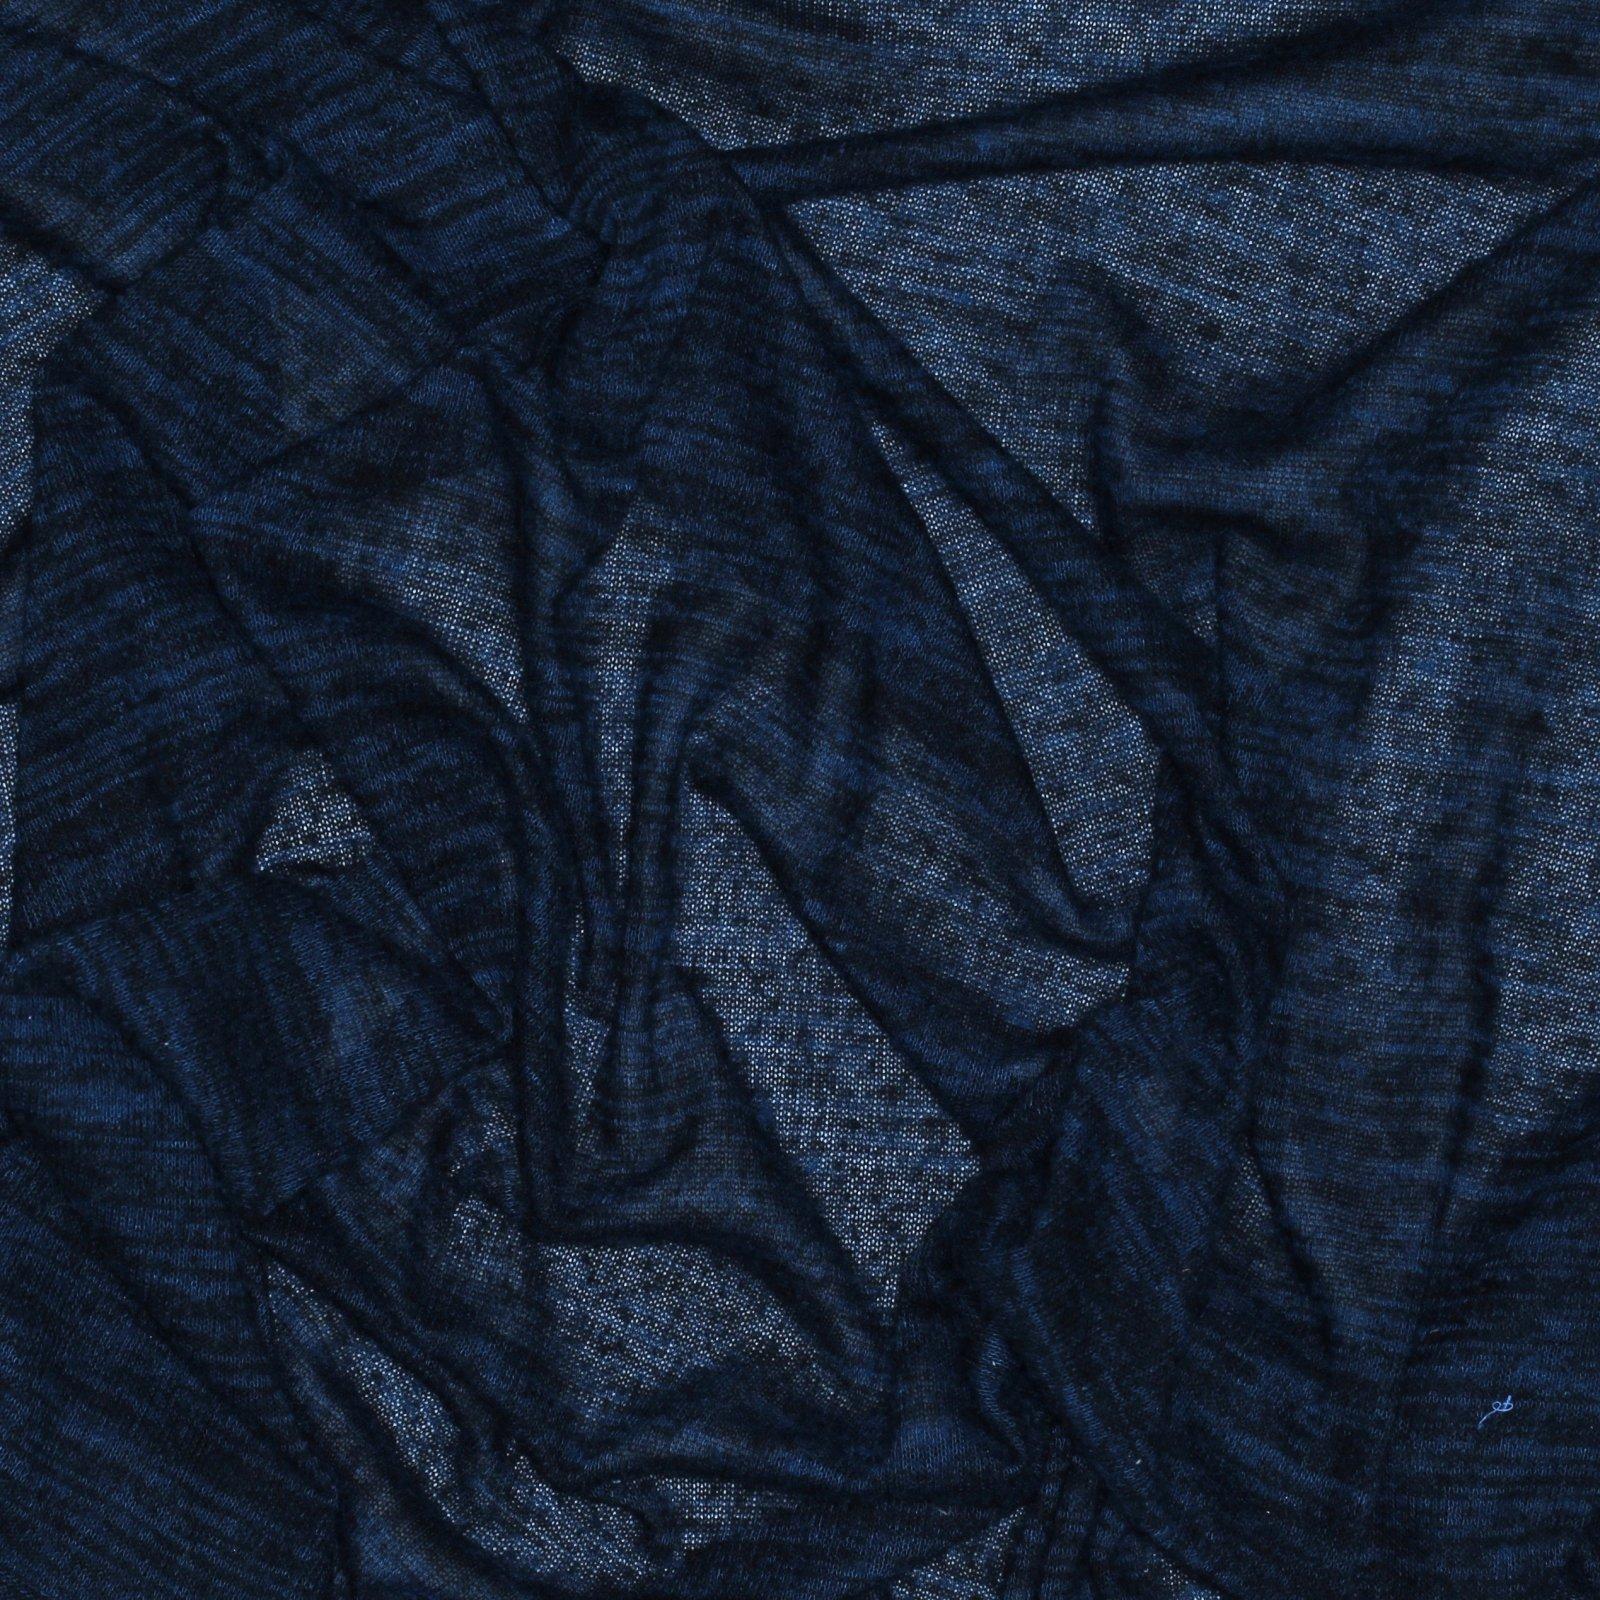 Black/Navy Heathered Sweater Knit